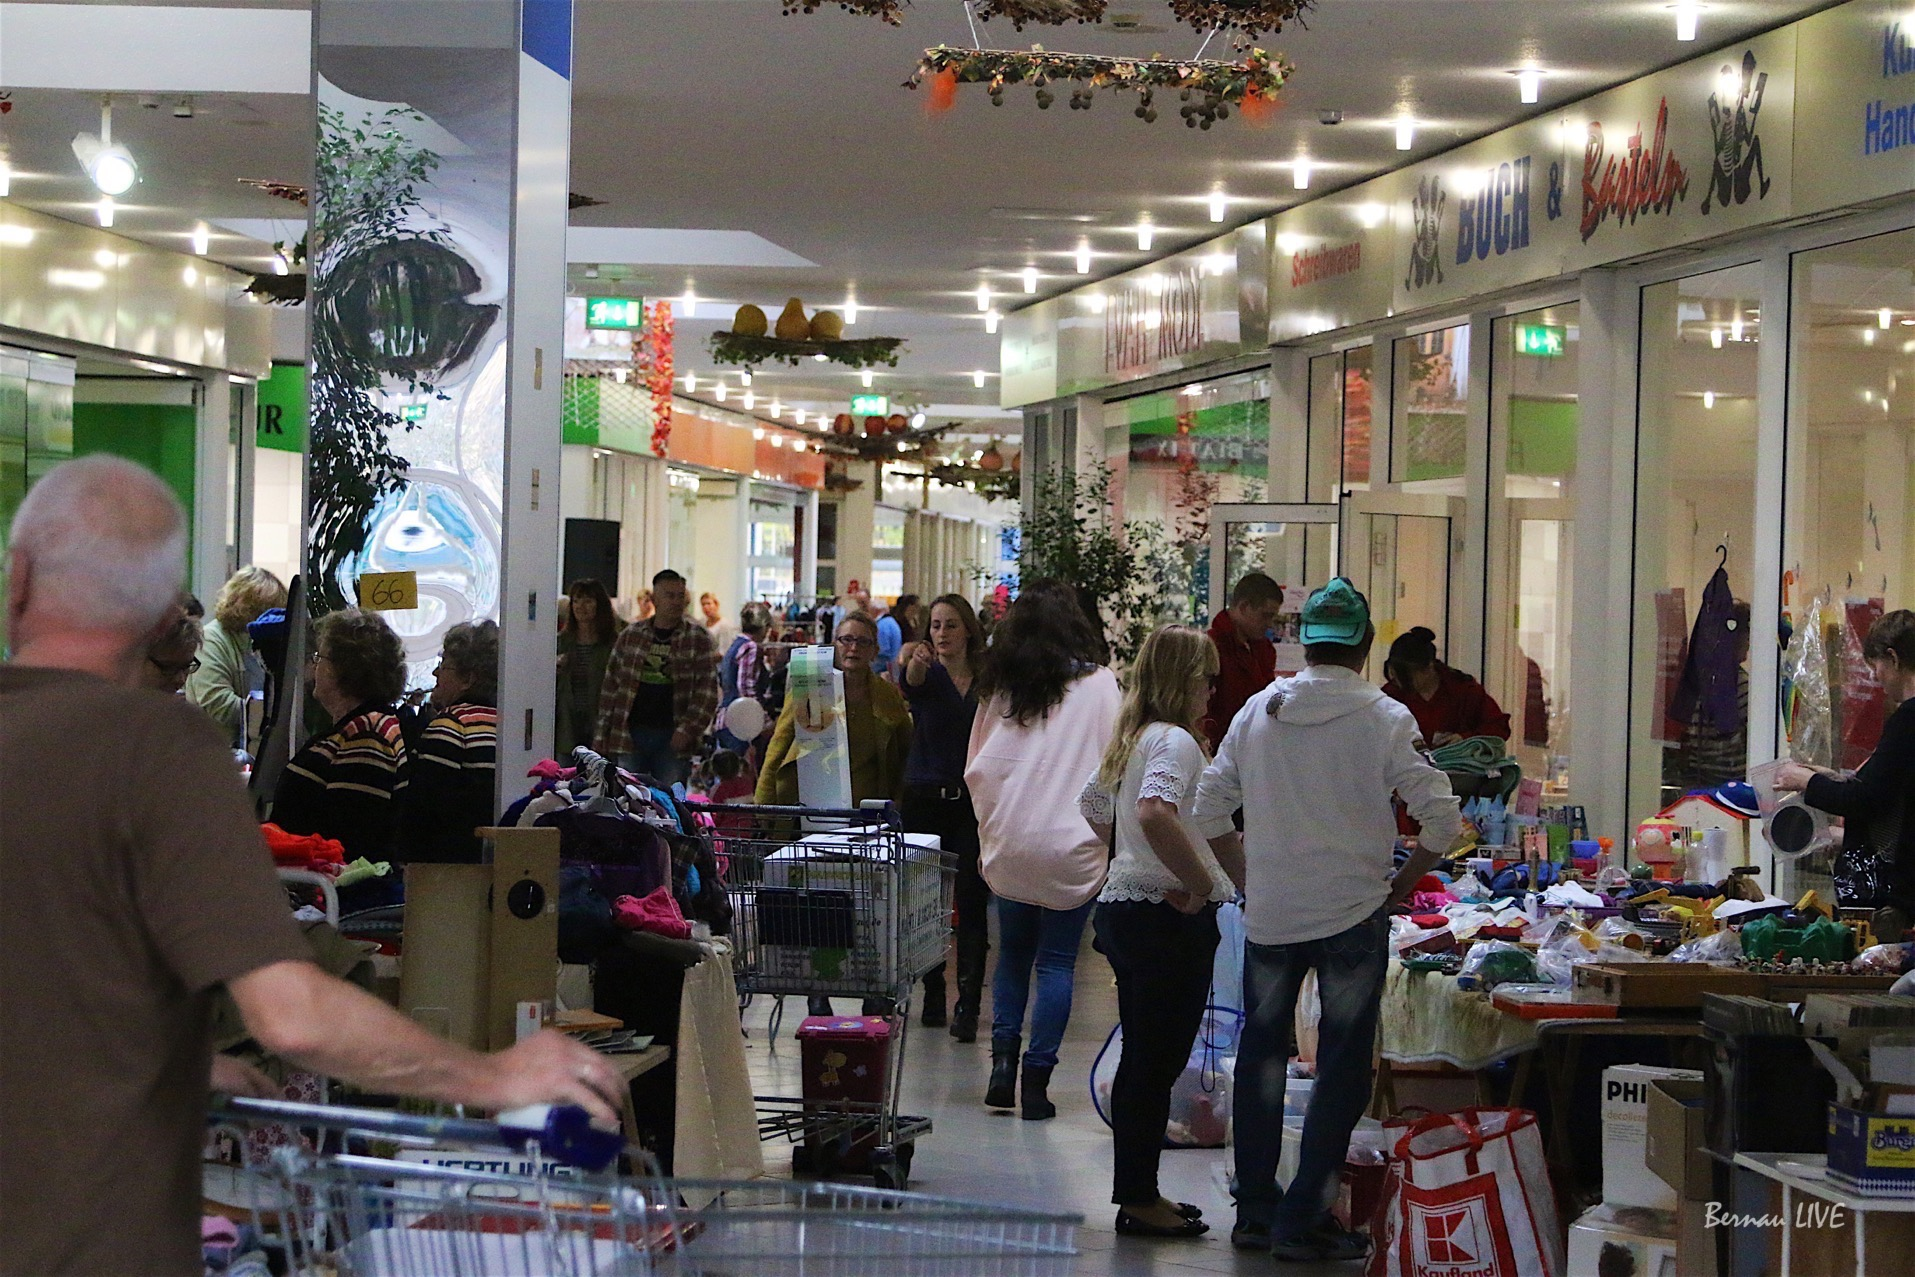 Samstag: Grosser Indoor-Flohmarkt im Forum Bernau